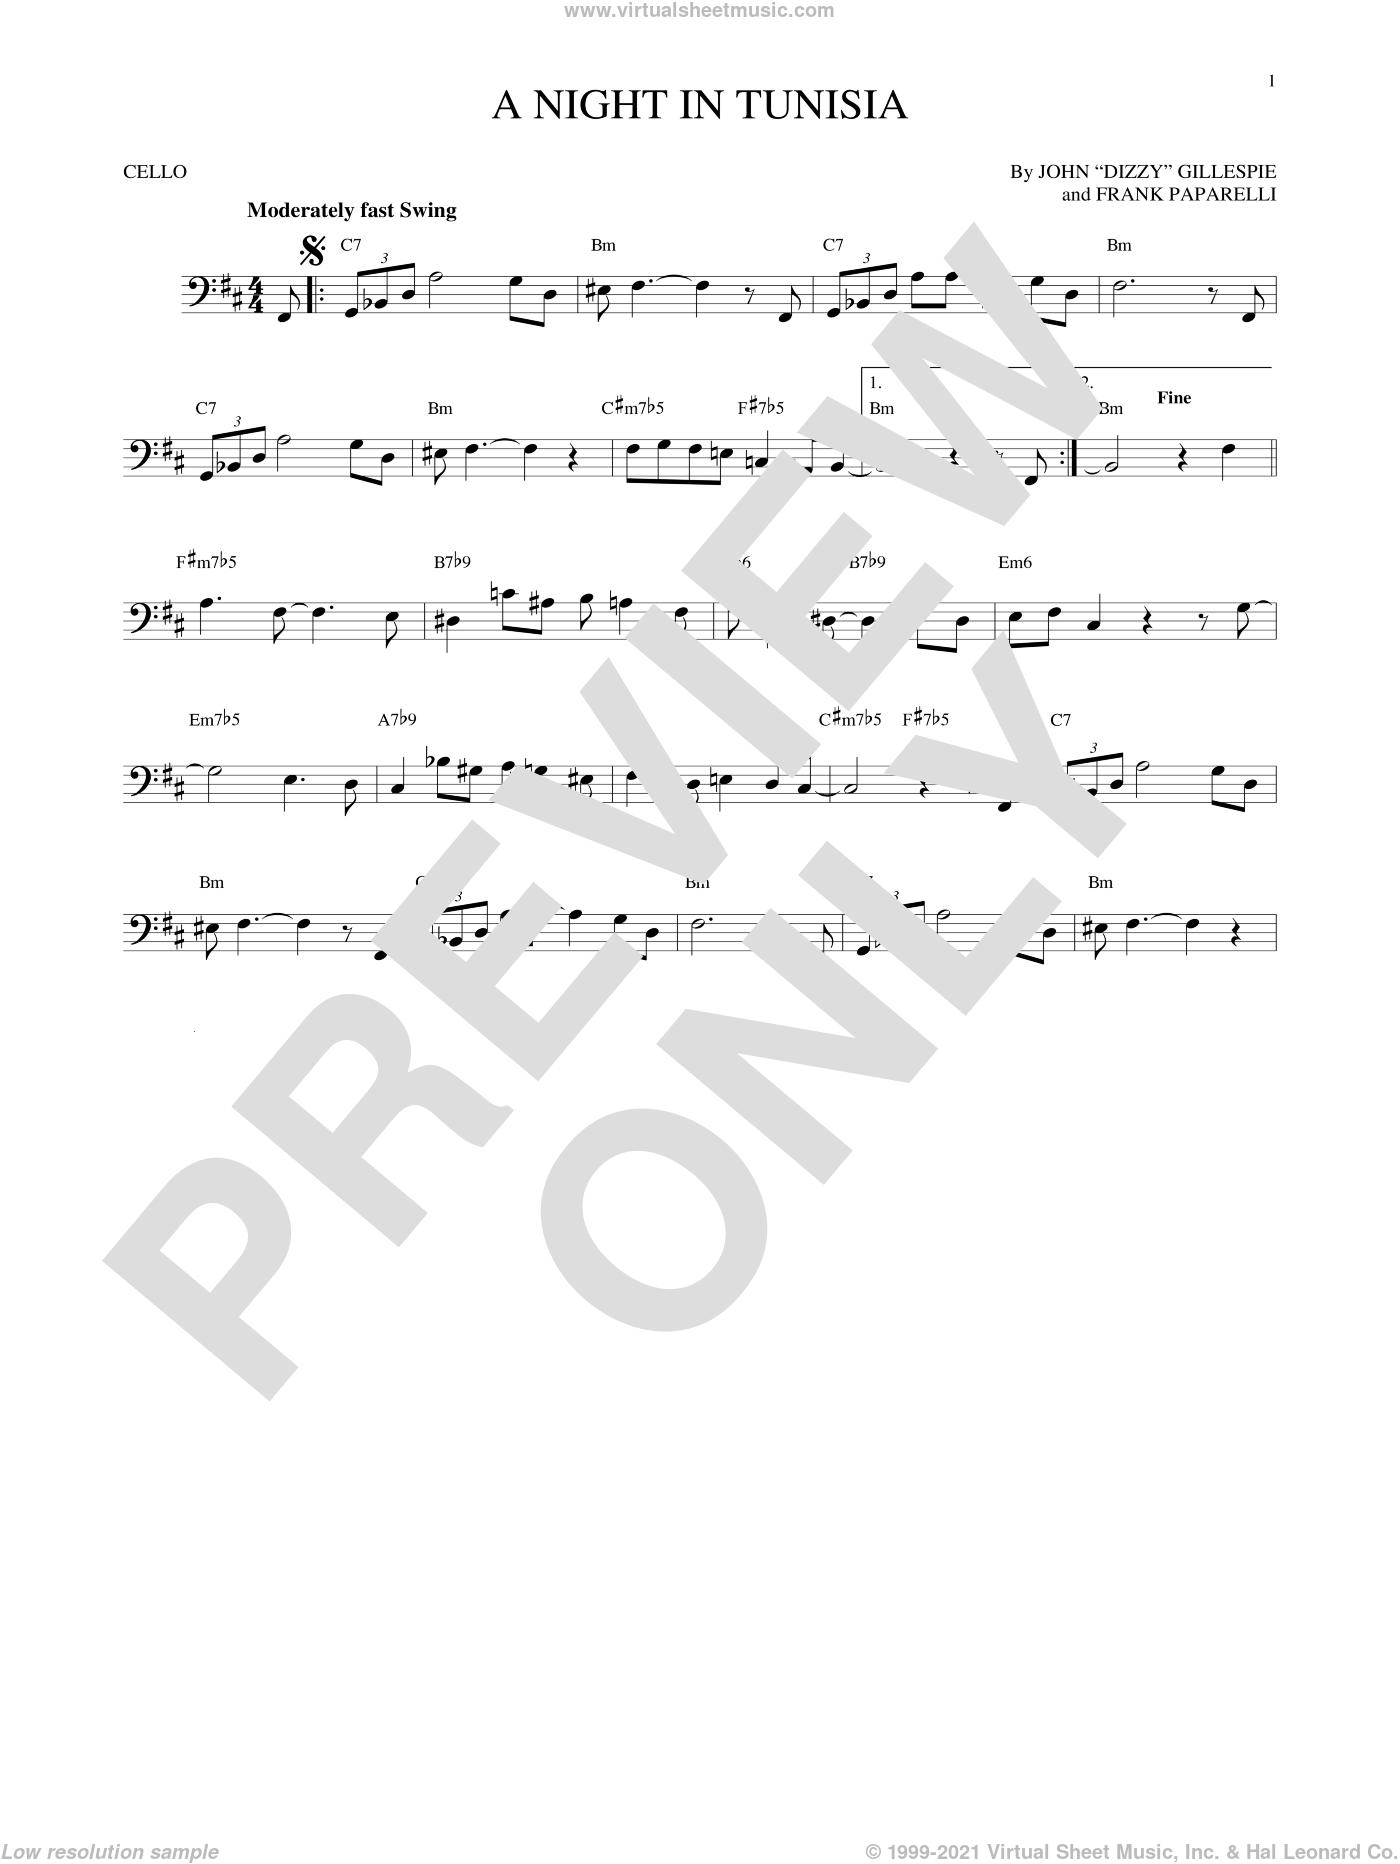 A Night In Tunisia sheet music for cello solo by Dizzy Gillespie and Frank Paparelli, intermediate skill level